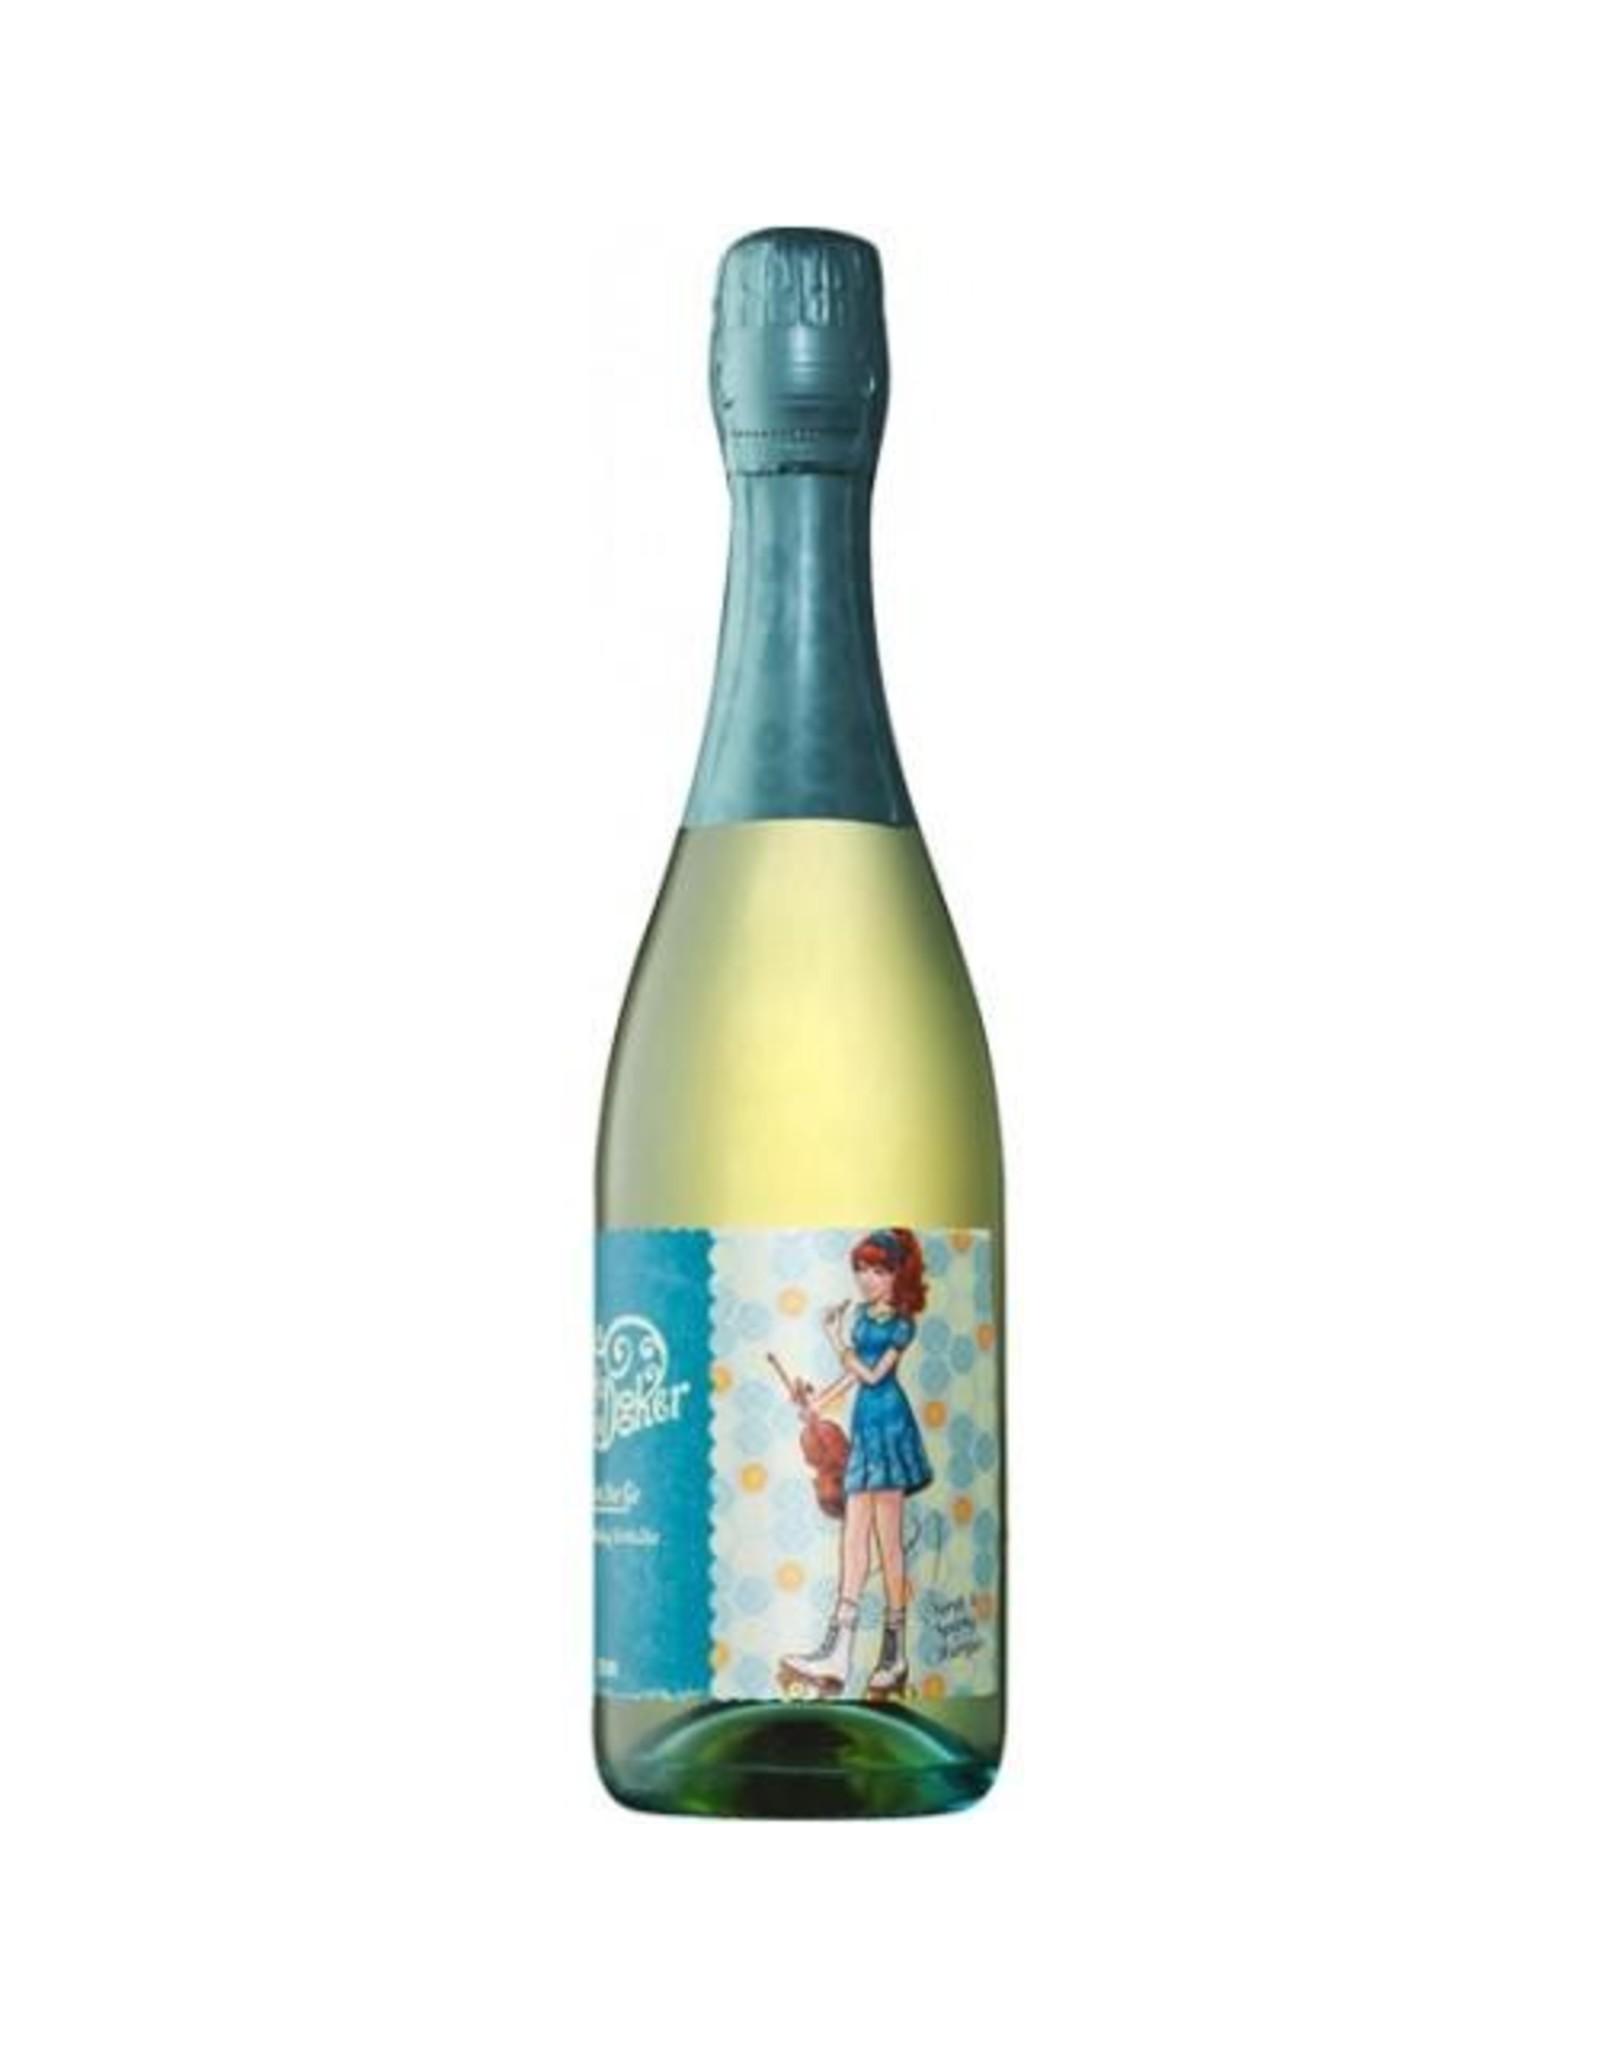 Sparkling Wine NV, Molly Dooker Girl on the Go, Sparkling Verdelho, McLaren Vale, Fleurieu, Australia, 14% Alc, CT88, TW90